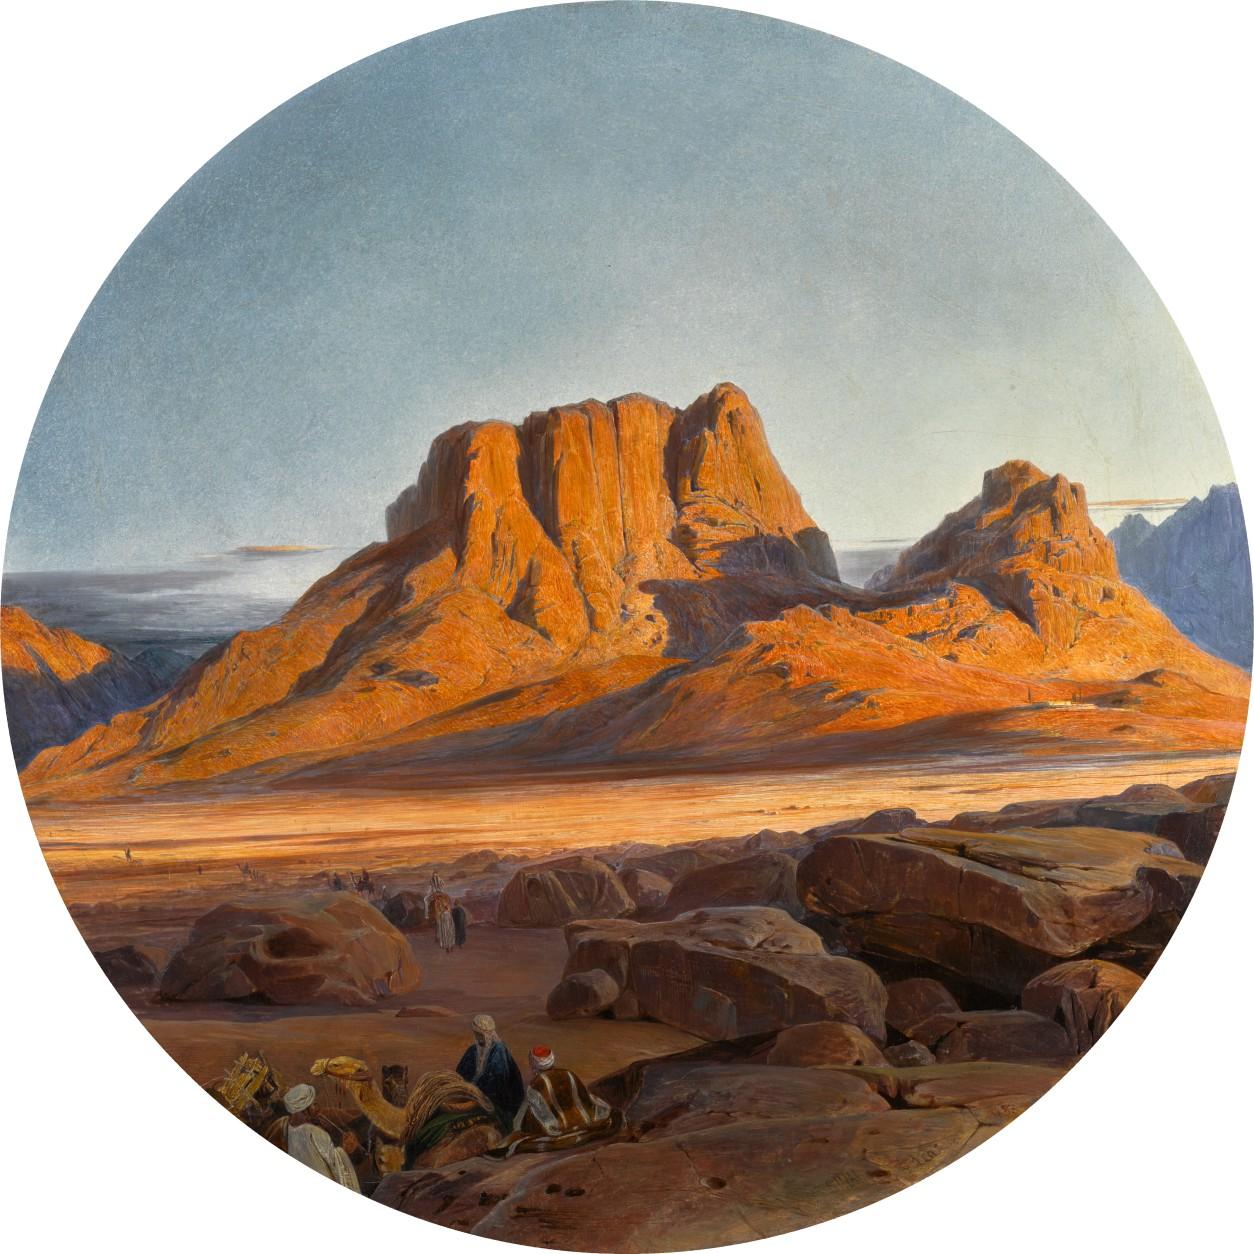 Edward Lear - Mound Sinai